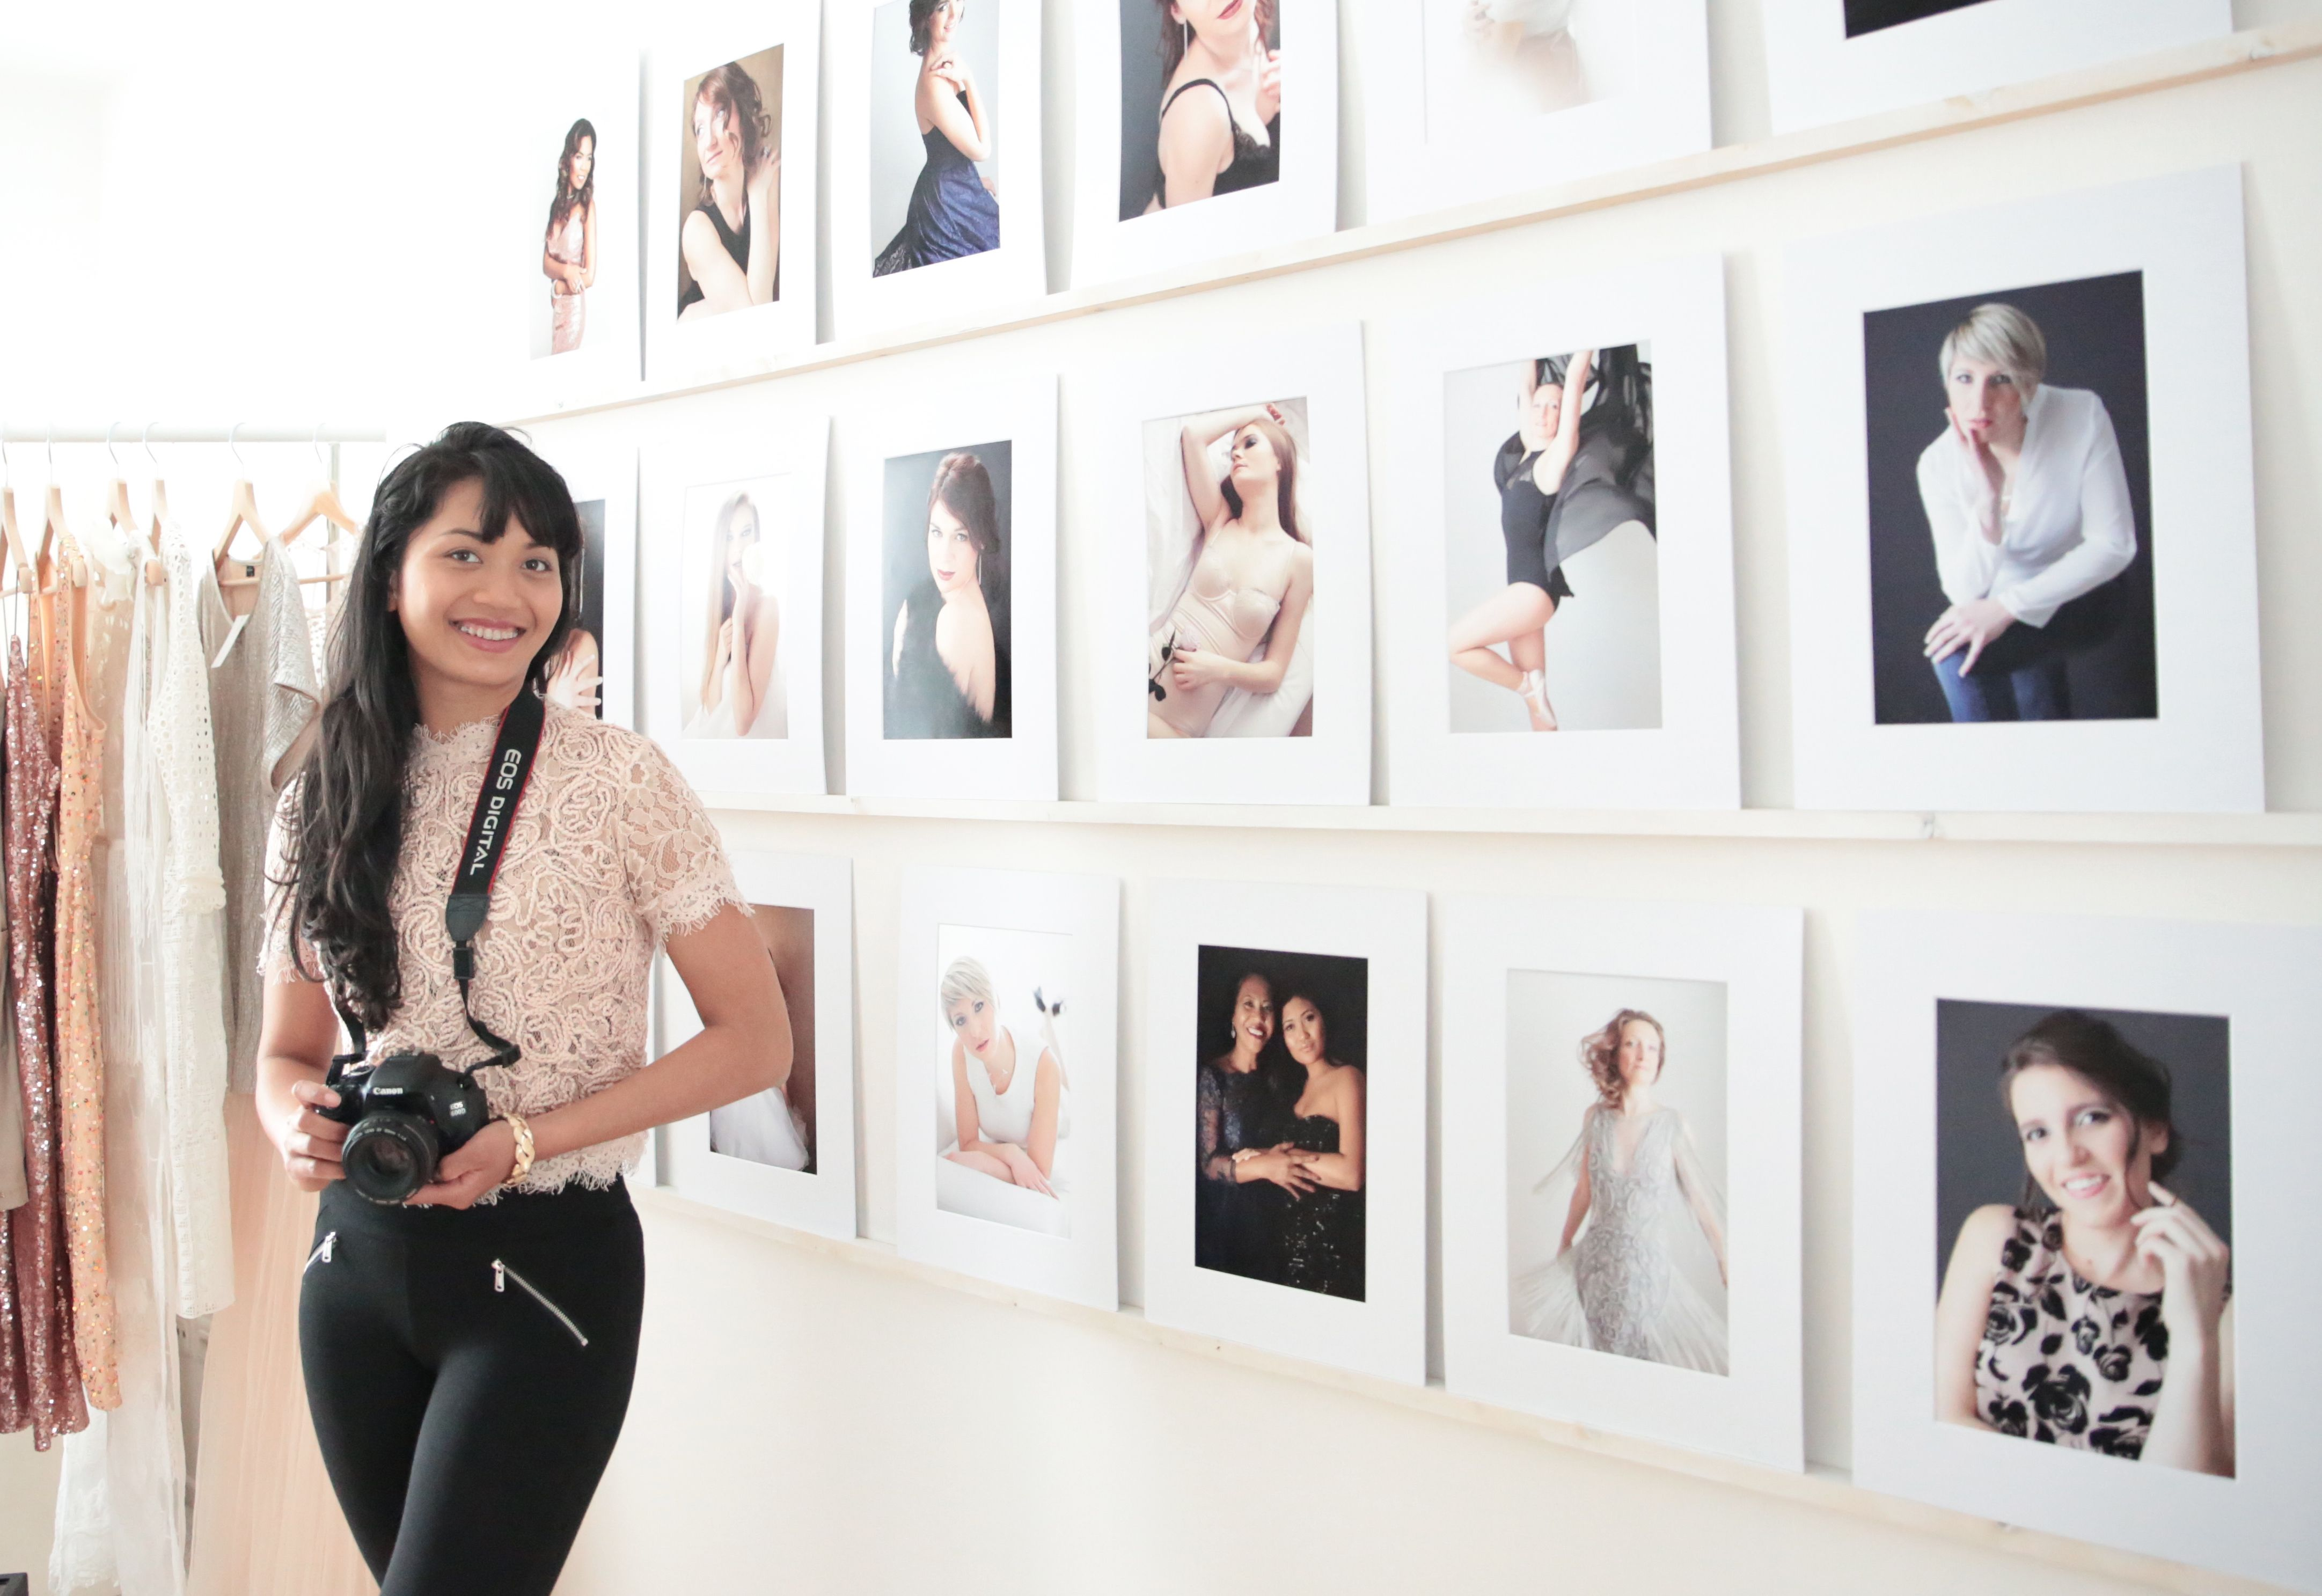 efi photography photographe studio alsace mulhouse shooting luxe portrait femme glamour efi. Black Bedroom Furniture Sets. Home Design Ideas